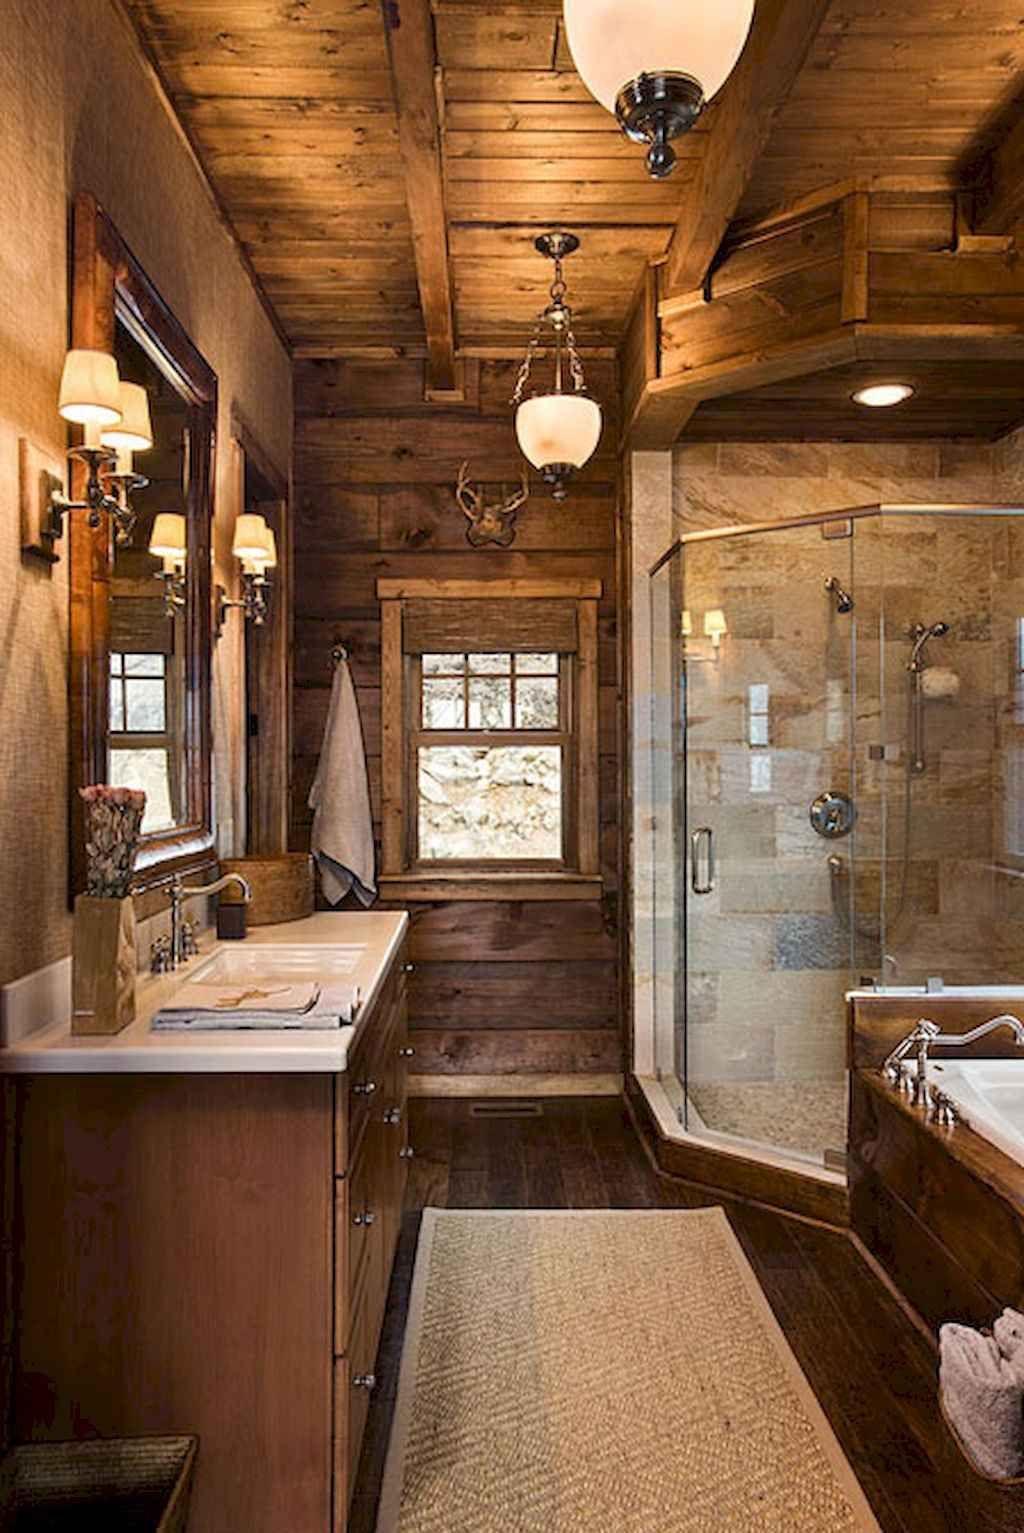 30 Rustic Bathroom Remodel Ideas Log Home Decorating Log Homes Log Home Builders